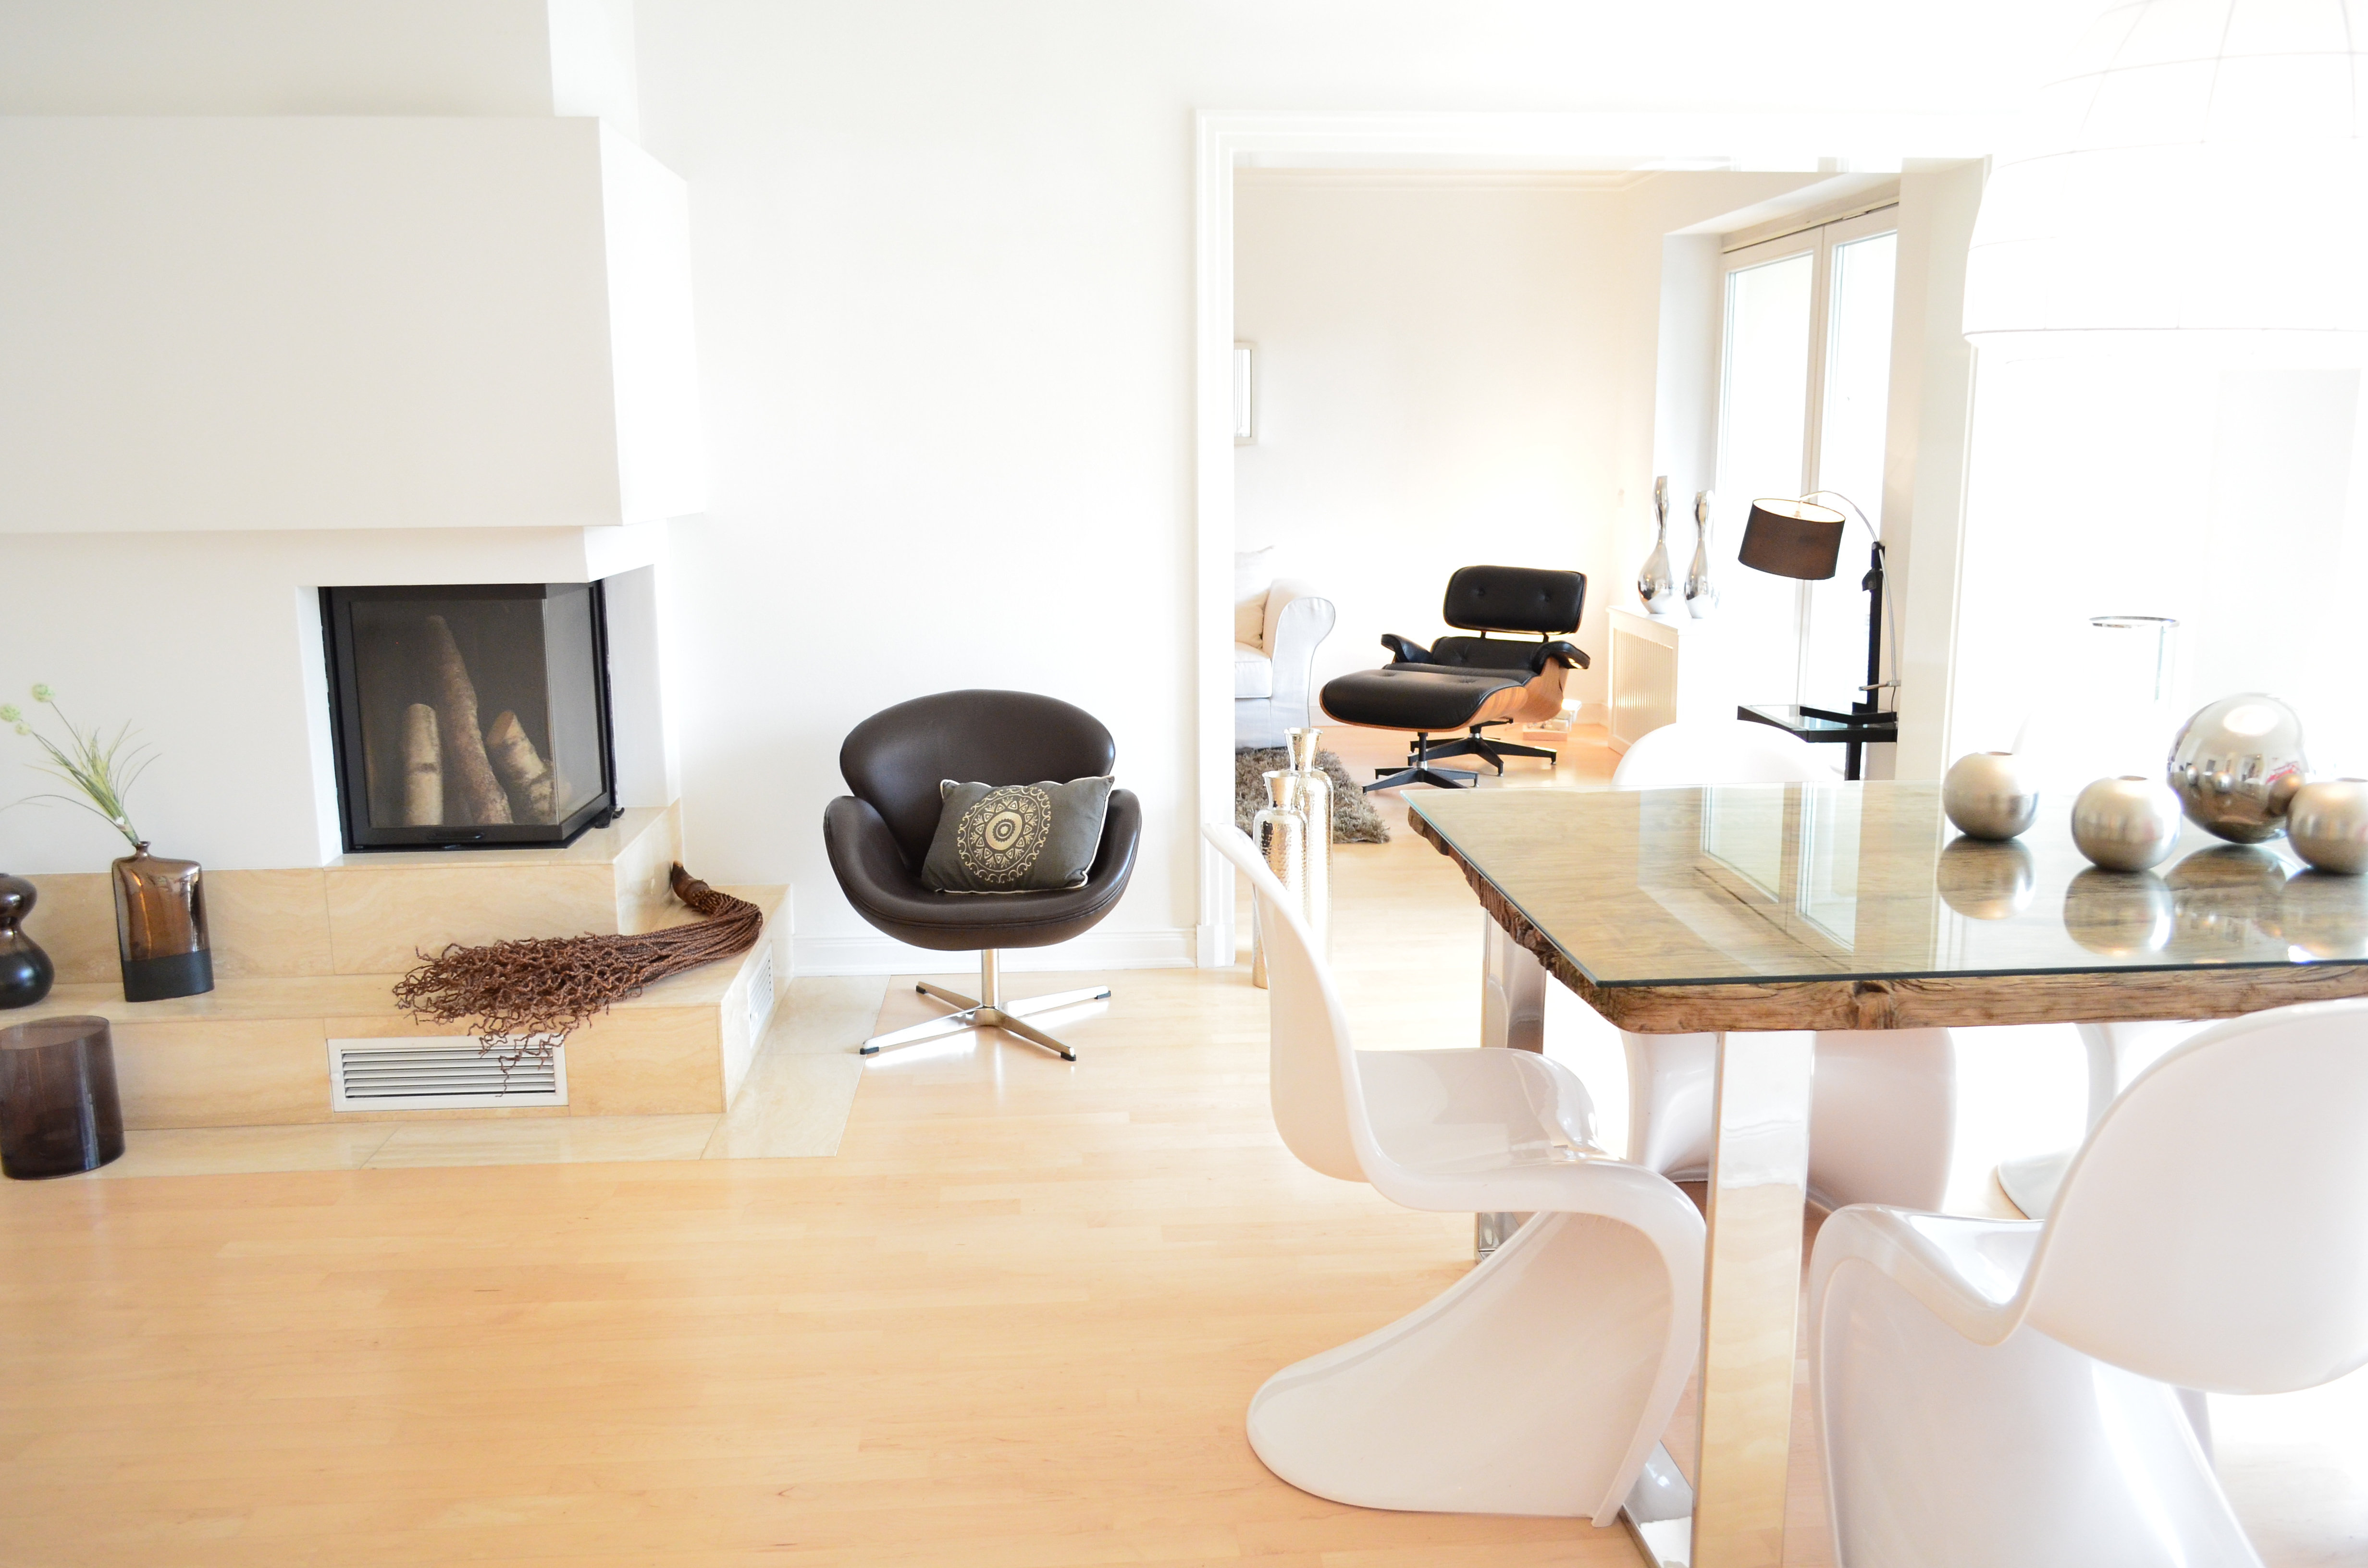 homestaging sandra kueppers in hamburg berlin hannover homestaging sandra k ppers. Black Bedroom Furniture Sets. Home Design Ideas